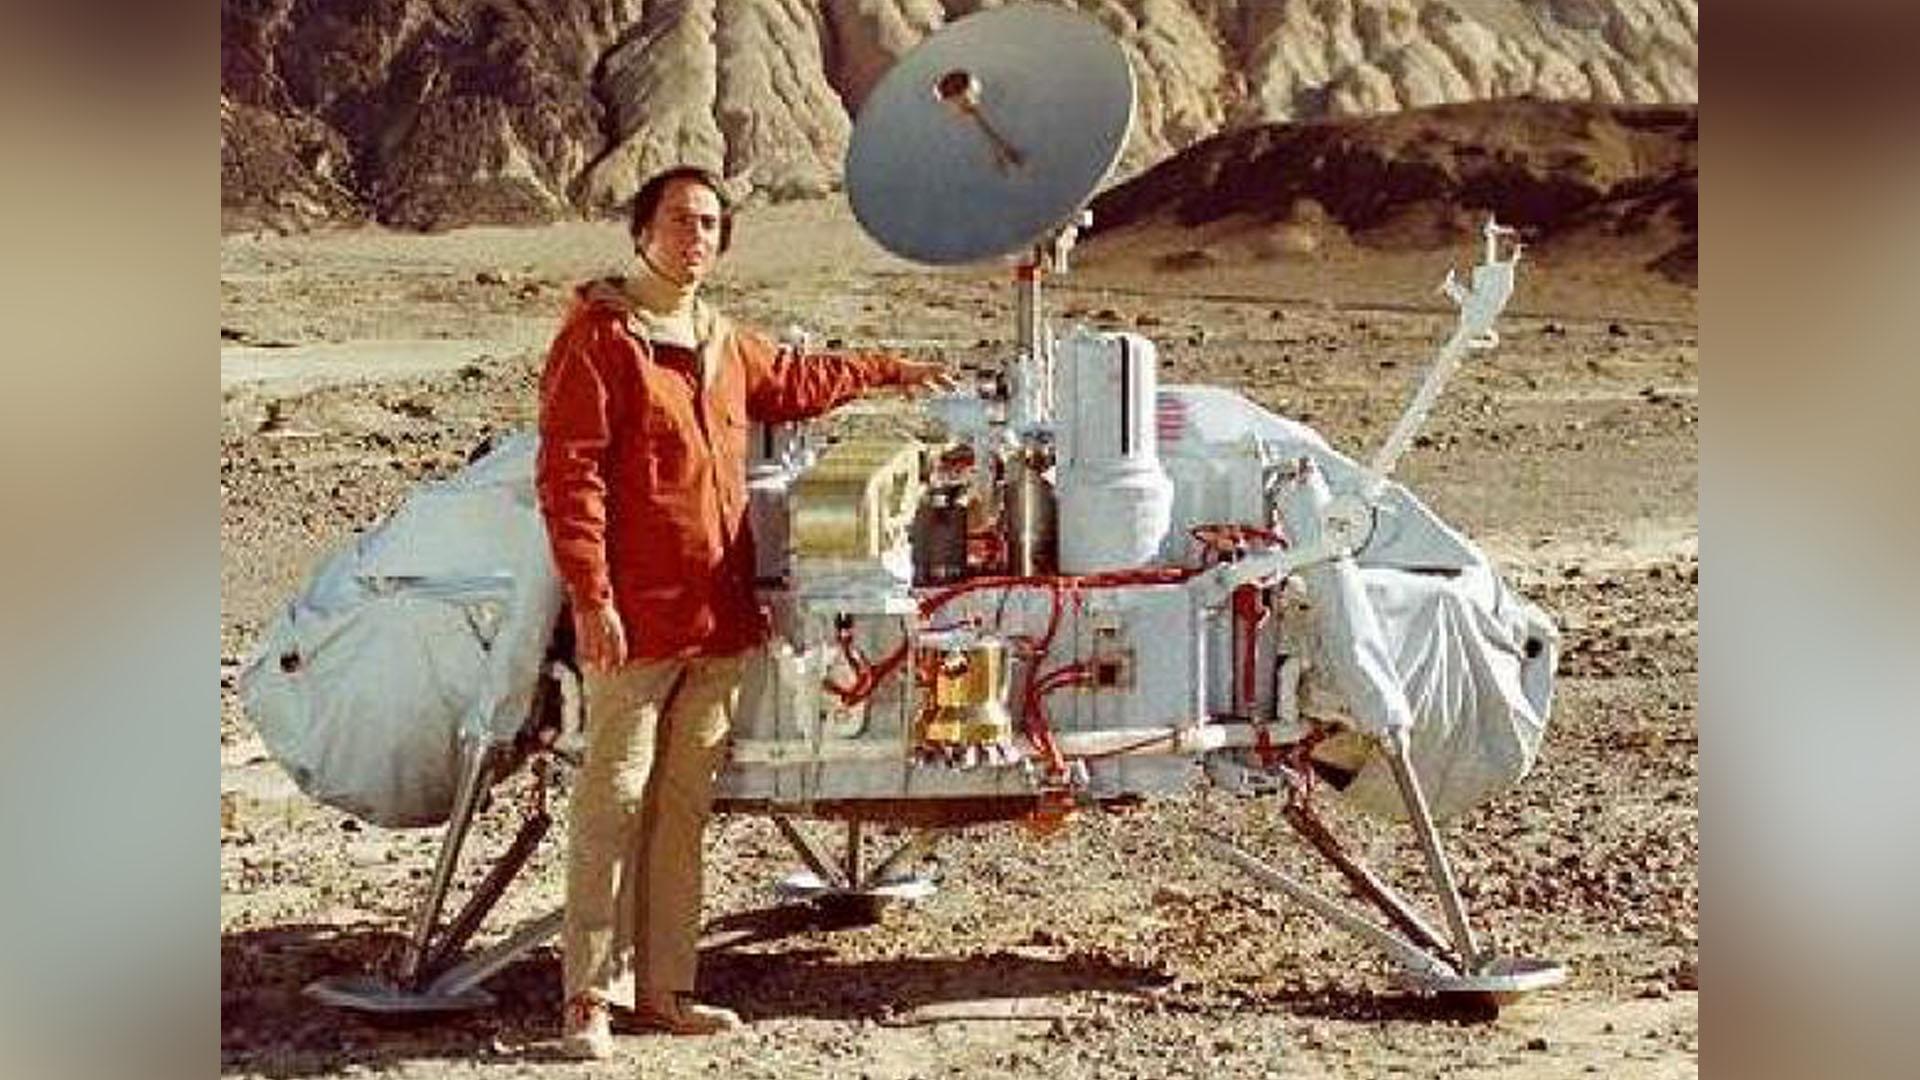 Carl Sagan junto a un modelo de la sonda Viking, que exploró el planeta Marte.